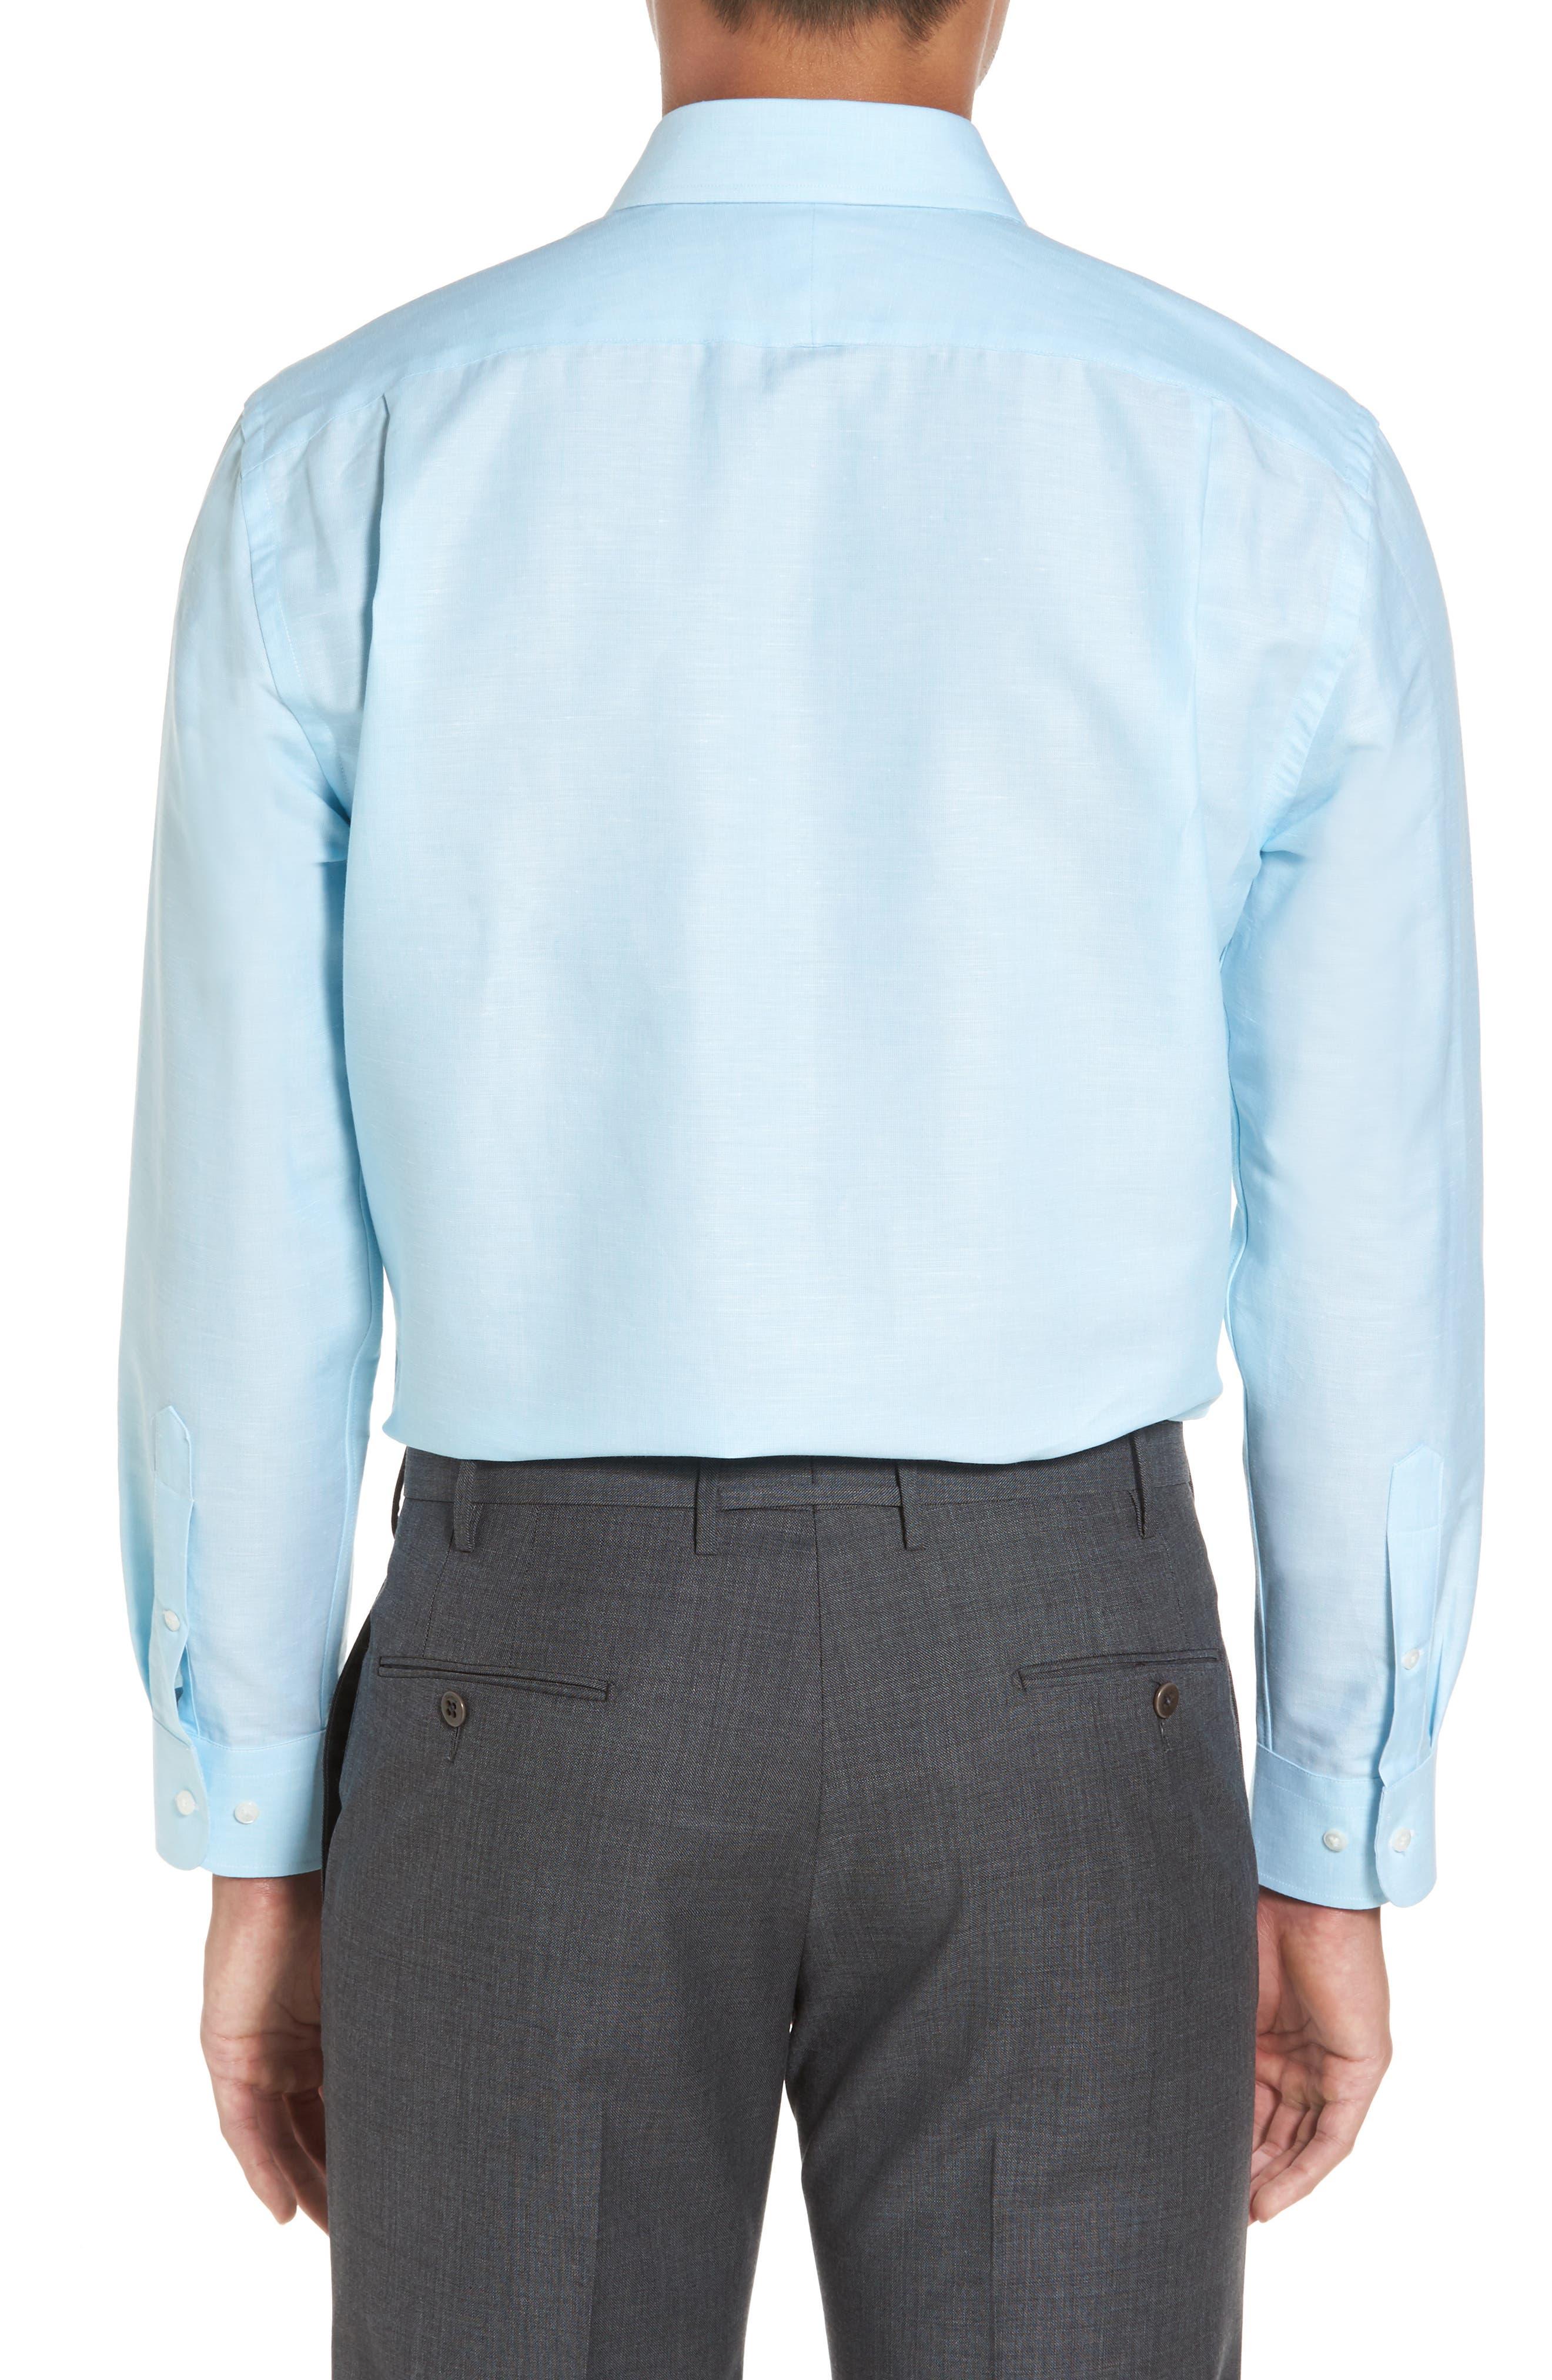 Alternate Image 3  - Nordstrom Men's Shop Trim Fit Solid Linen & Cotton Dress Shirt